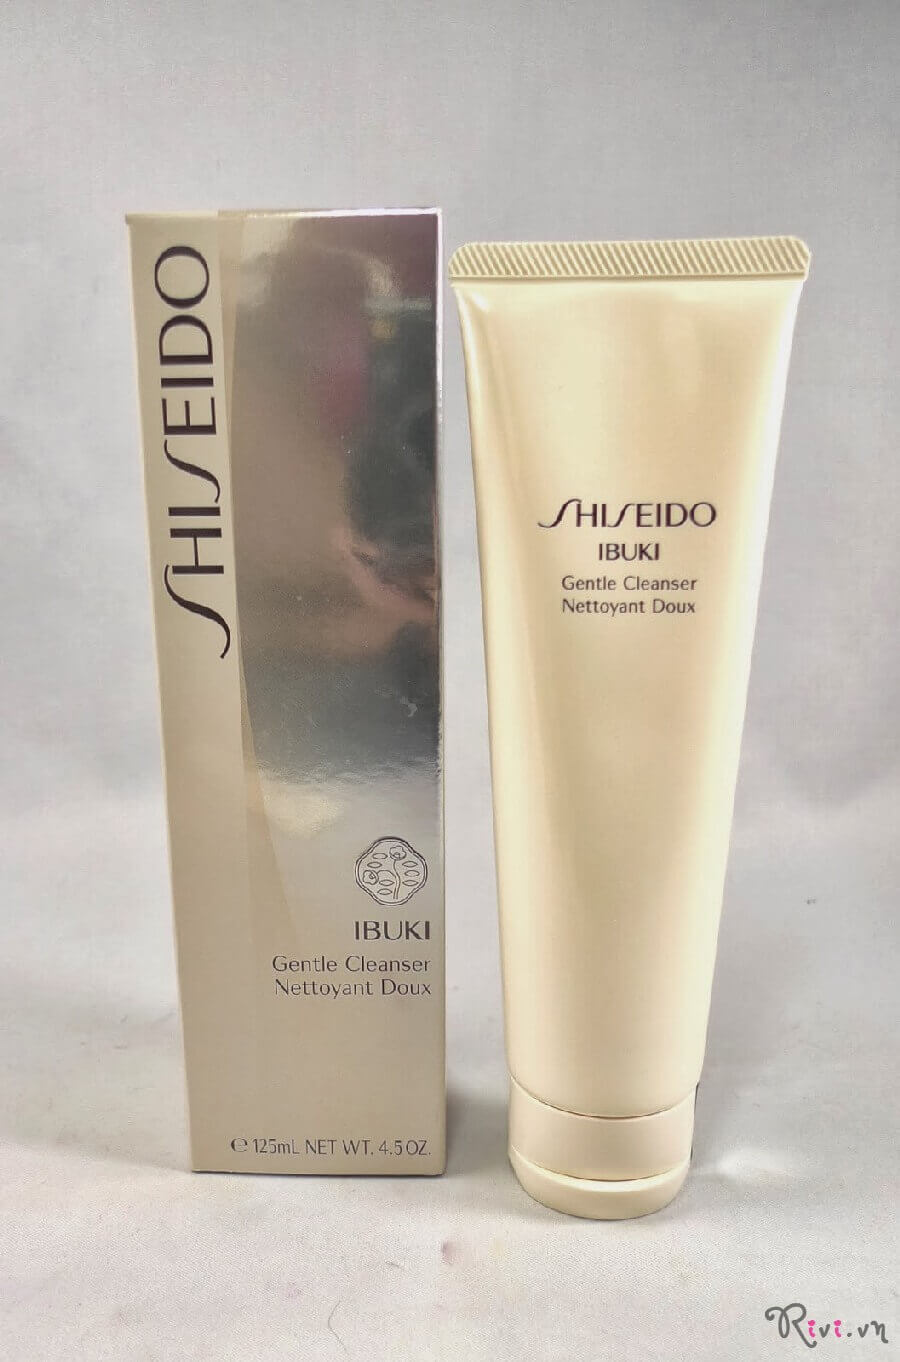 sua-rua-mat-shiseido-gentle-cleanser-01